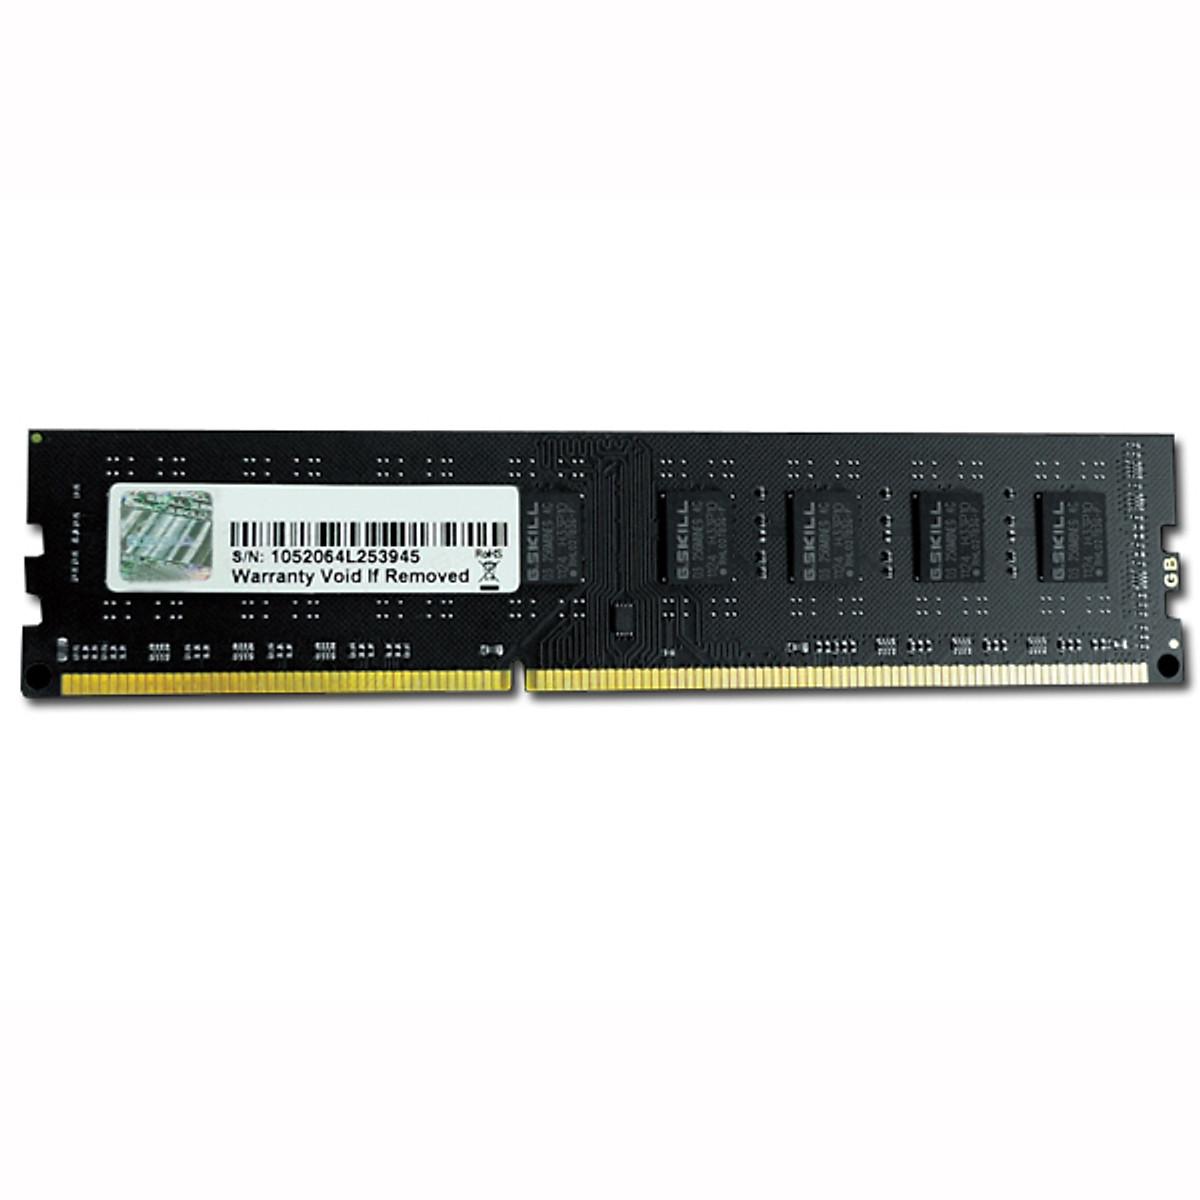 Ram DDR3 G.Skill 8GB (1600) F3-1600C11S-8GNT